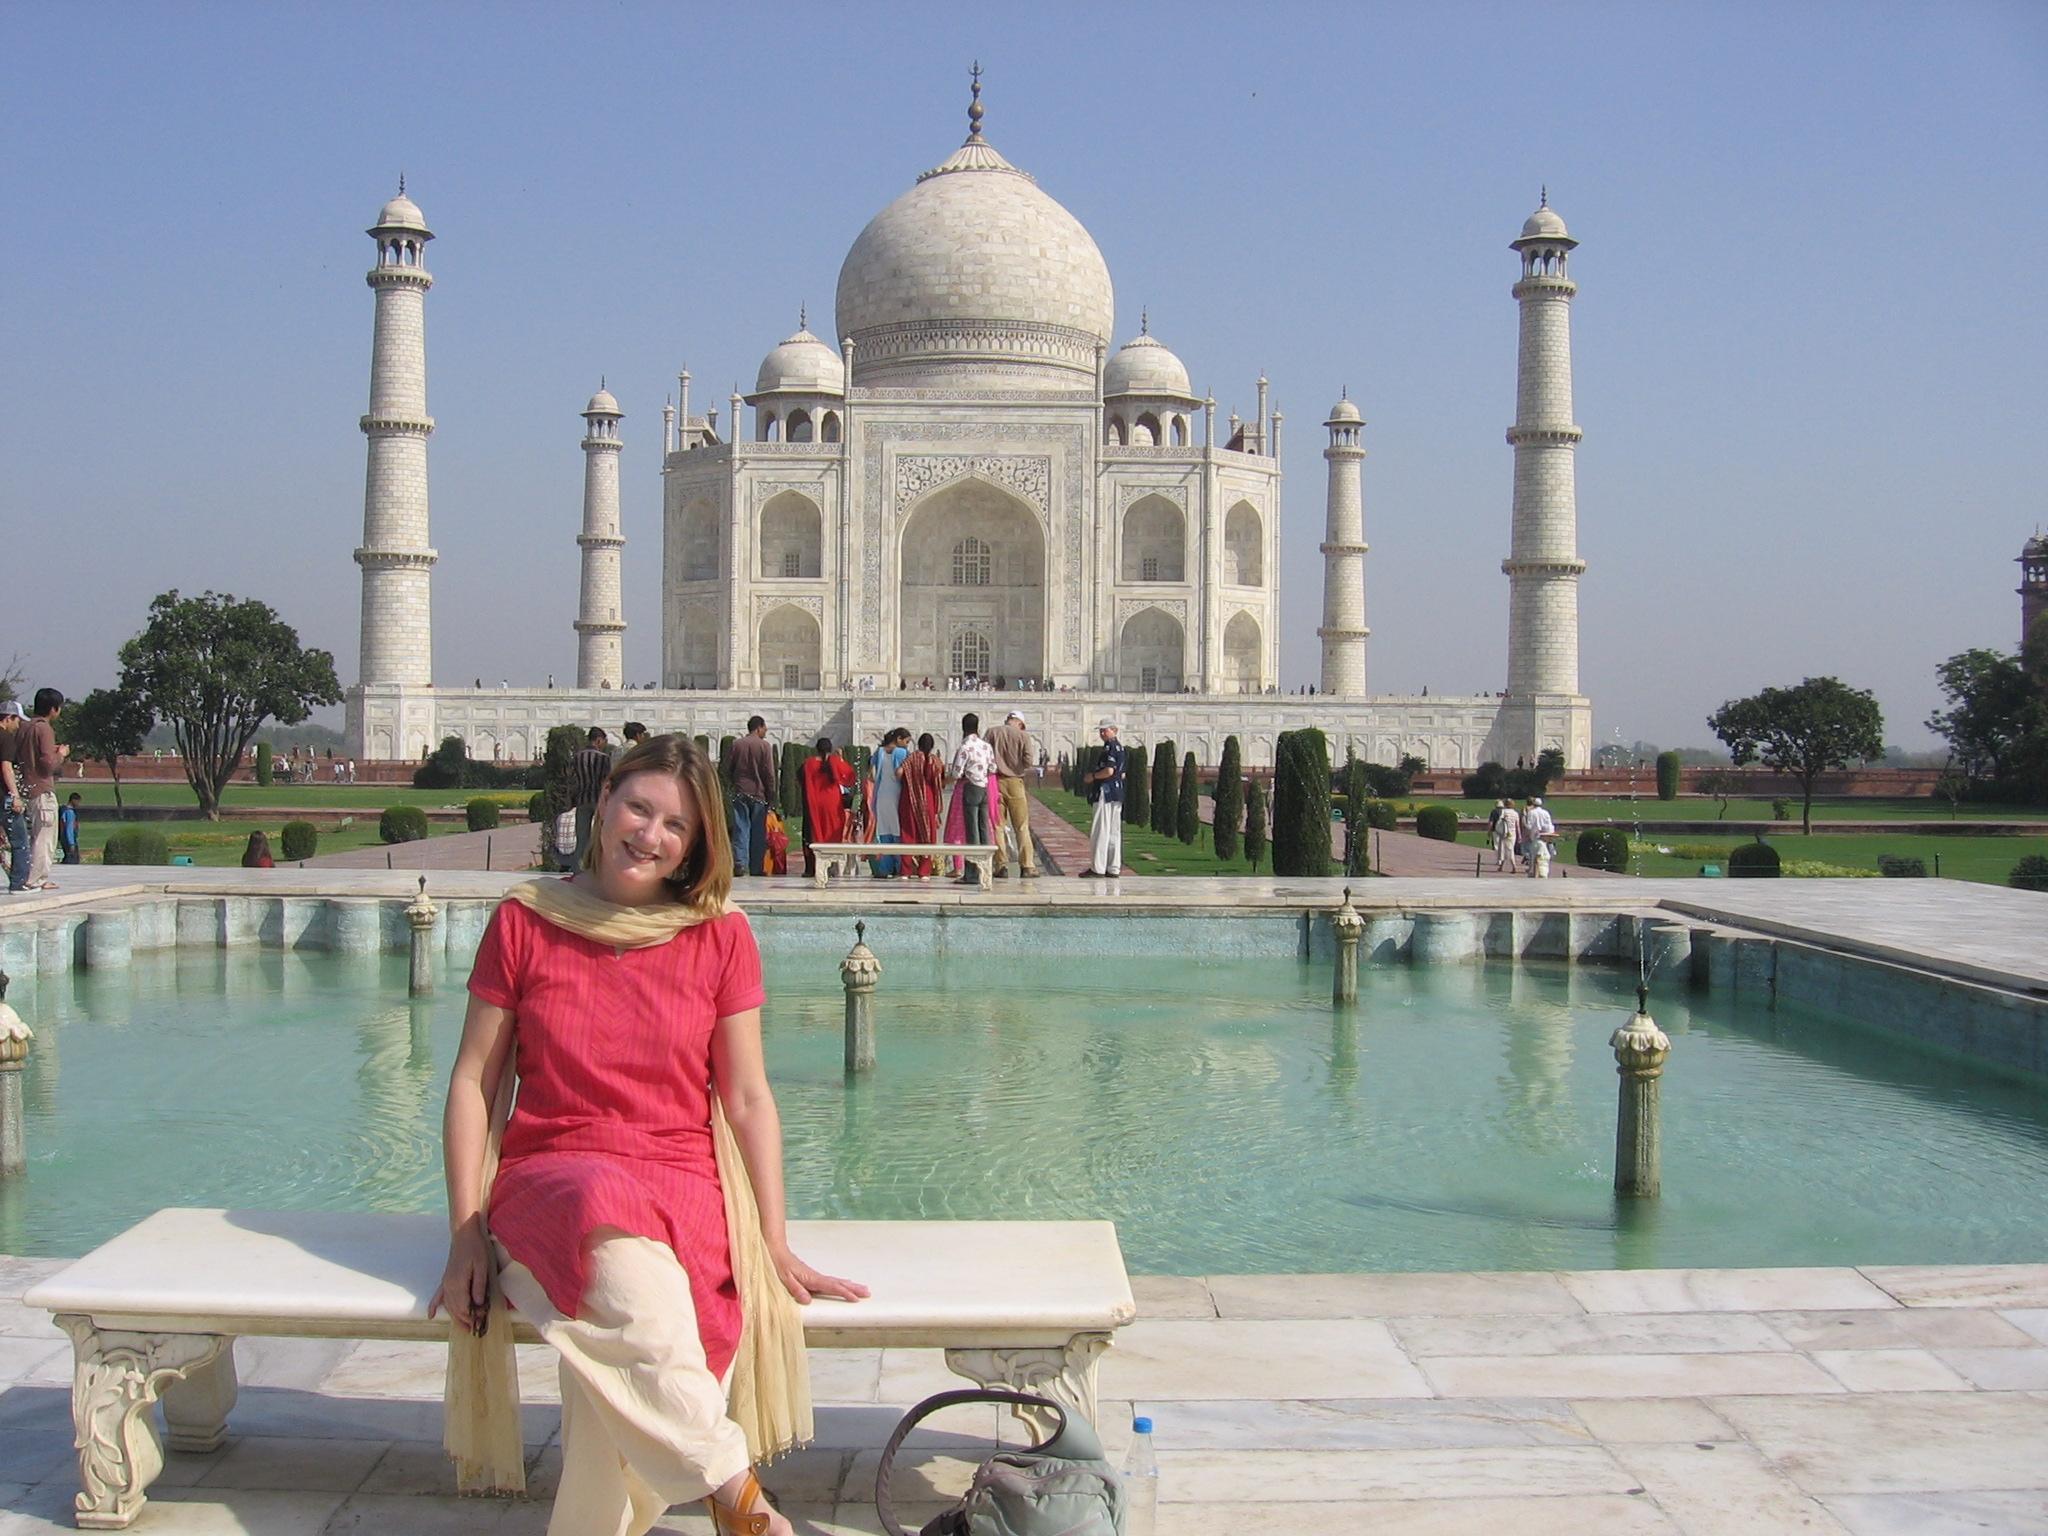 moi at the Taj Mahal